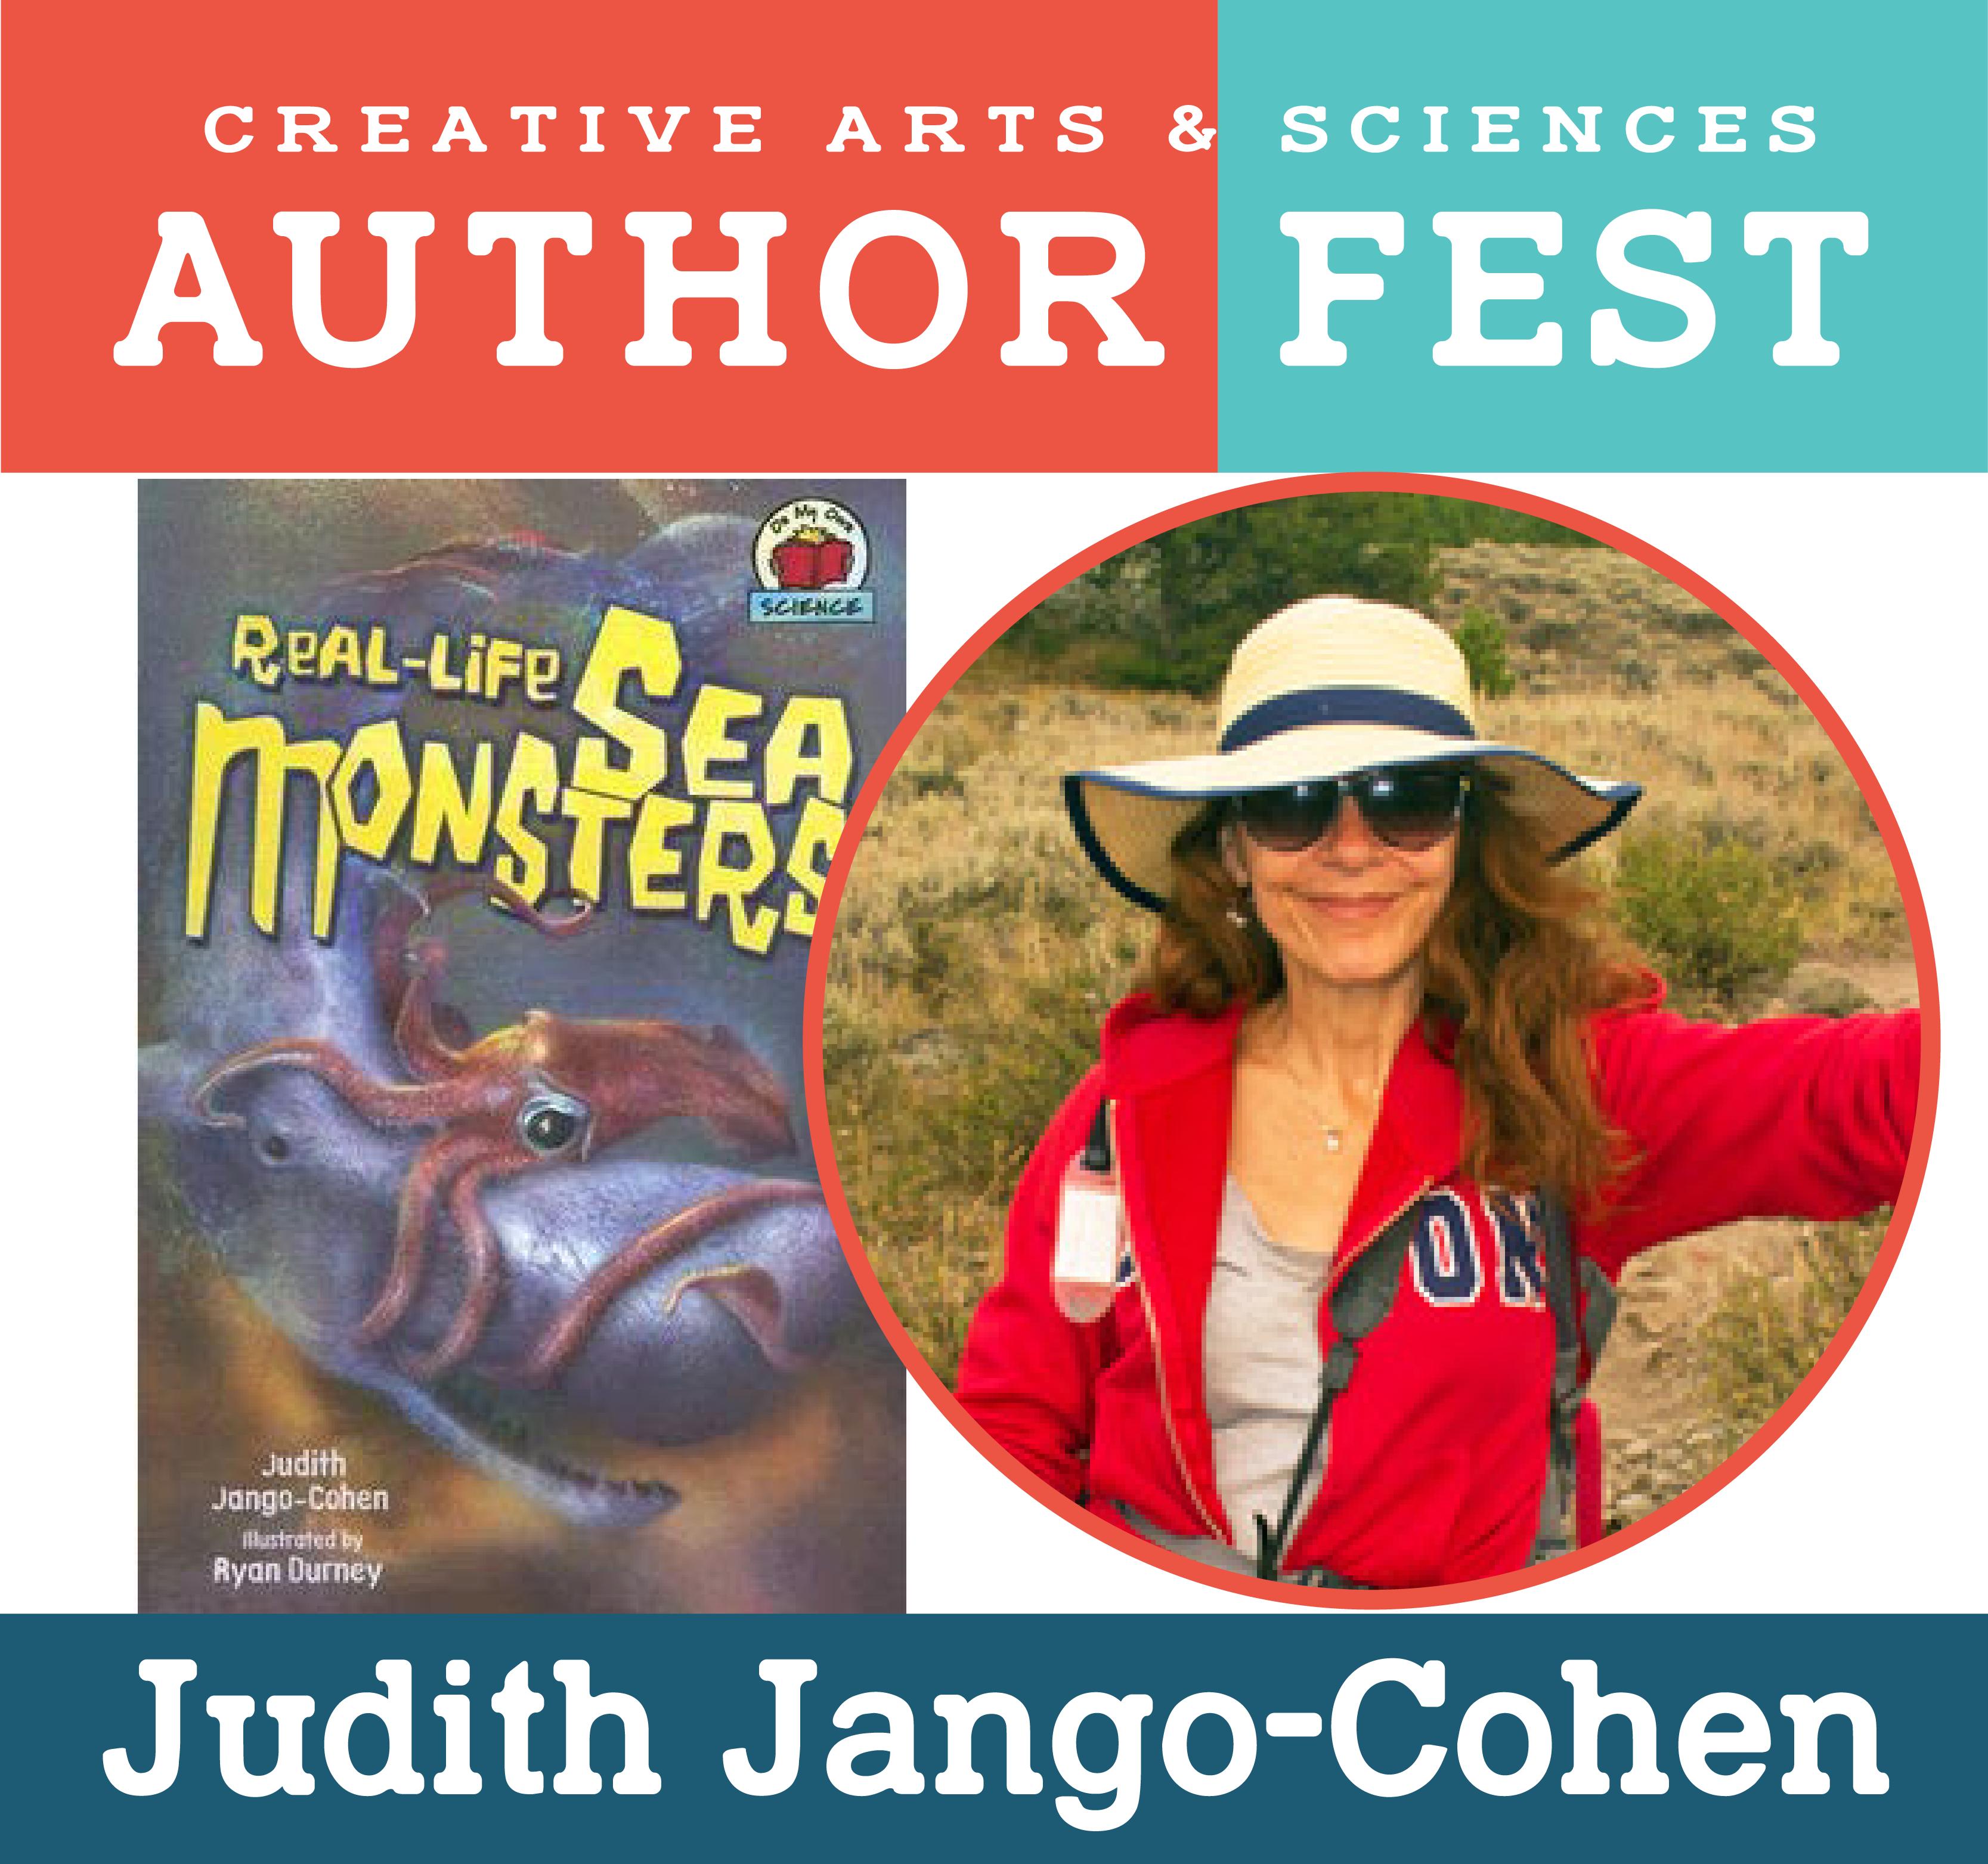 AF Author Promo_Judith Jango-Cohen